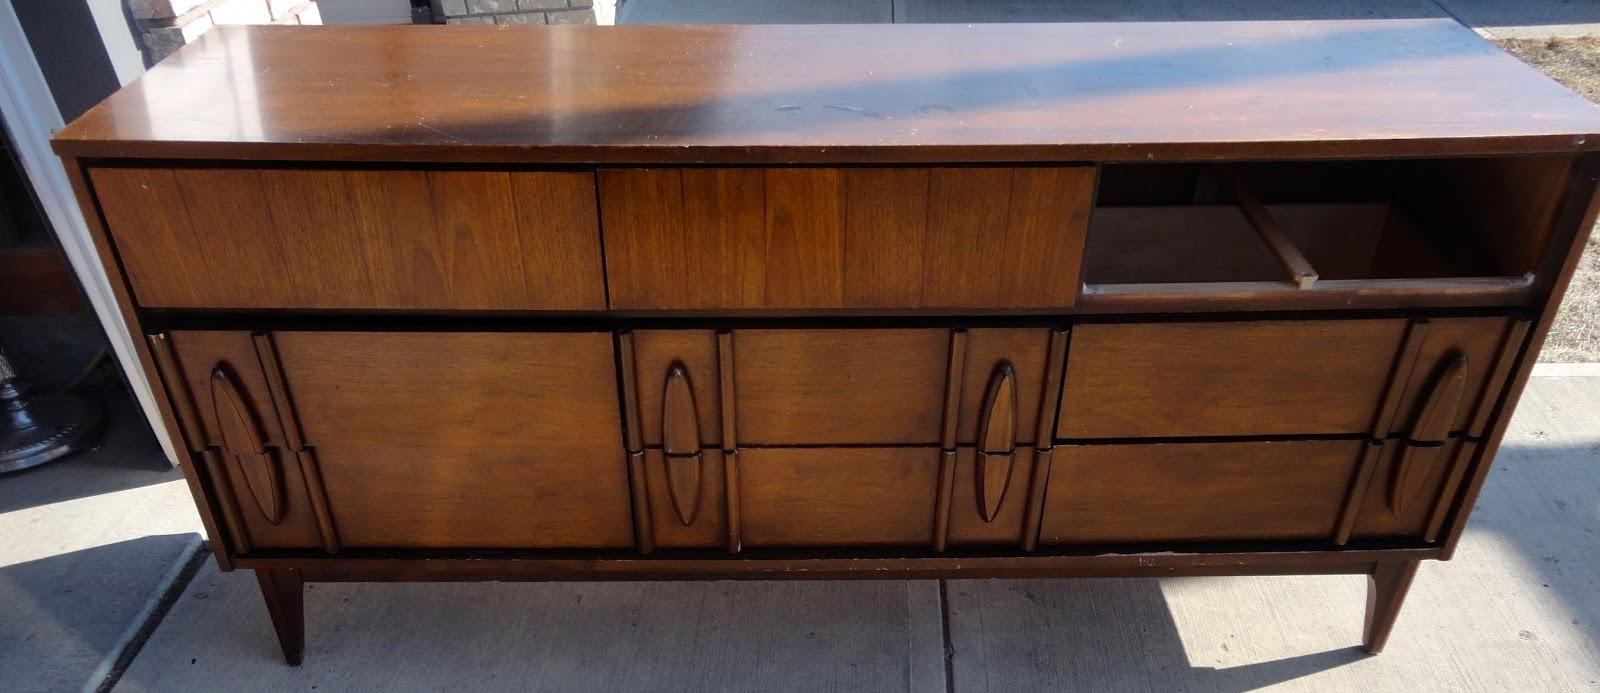 black retro multimedia cabinet little green table. Black Bedroom Furniture Sets. Home Design Ideas